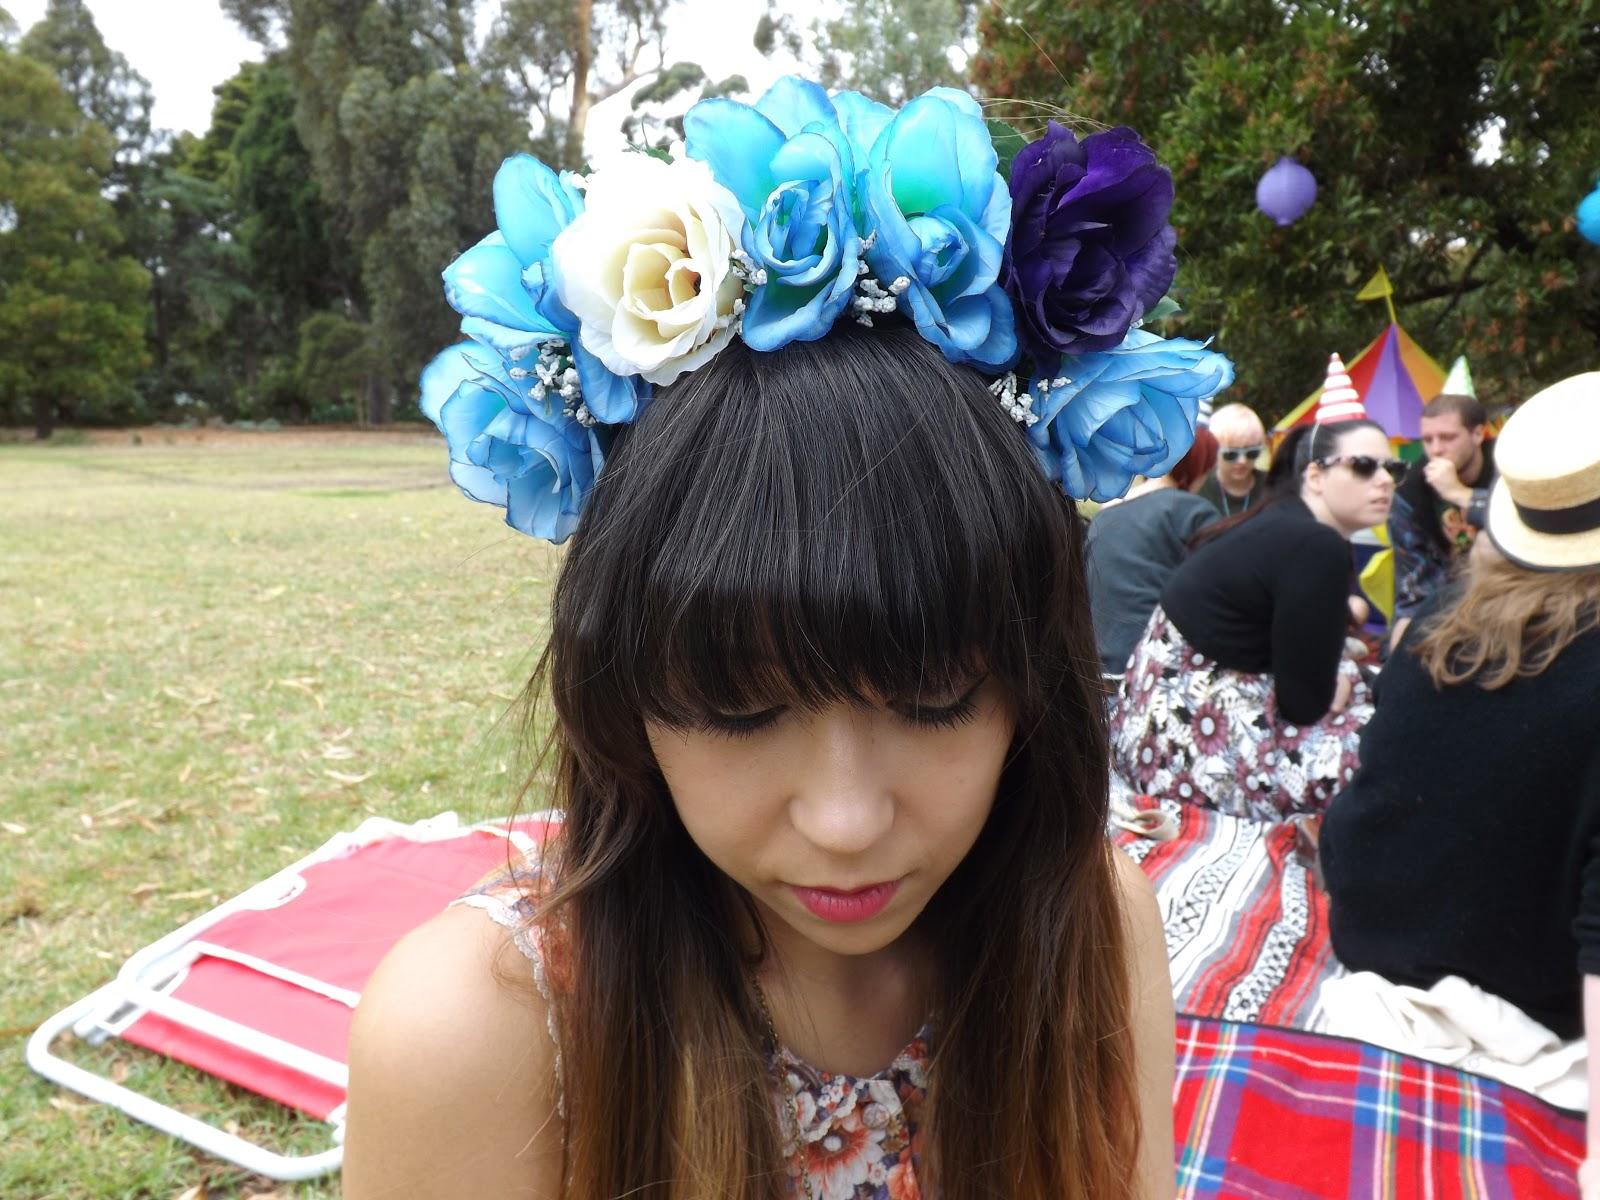 Diy flower crowns taken by surprise diy flower crowns izmirmasajfo